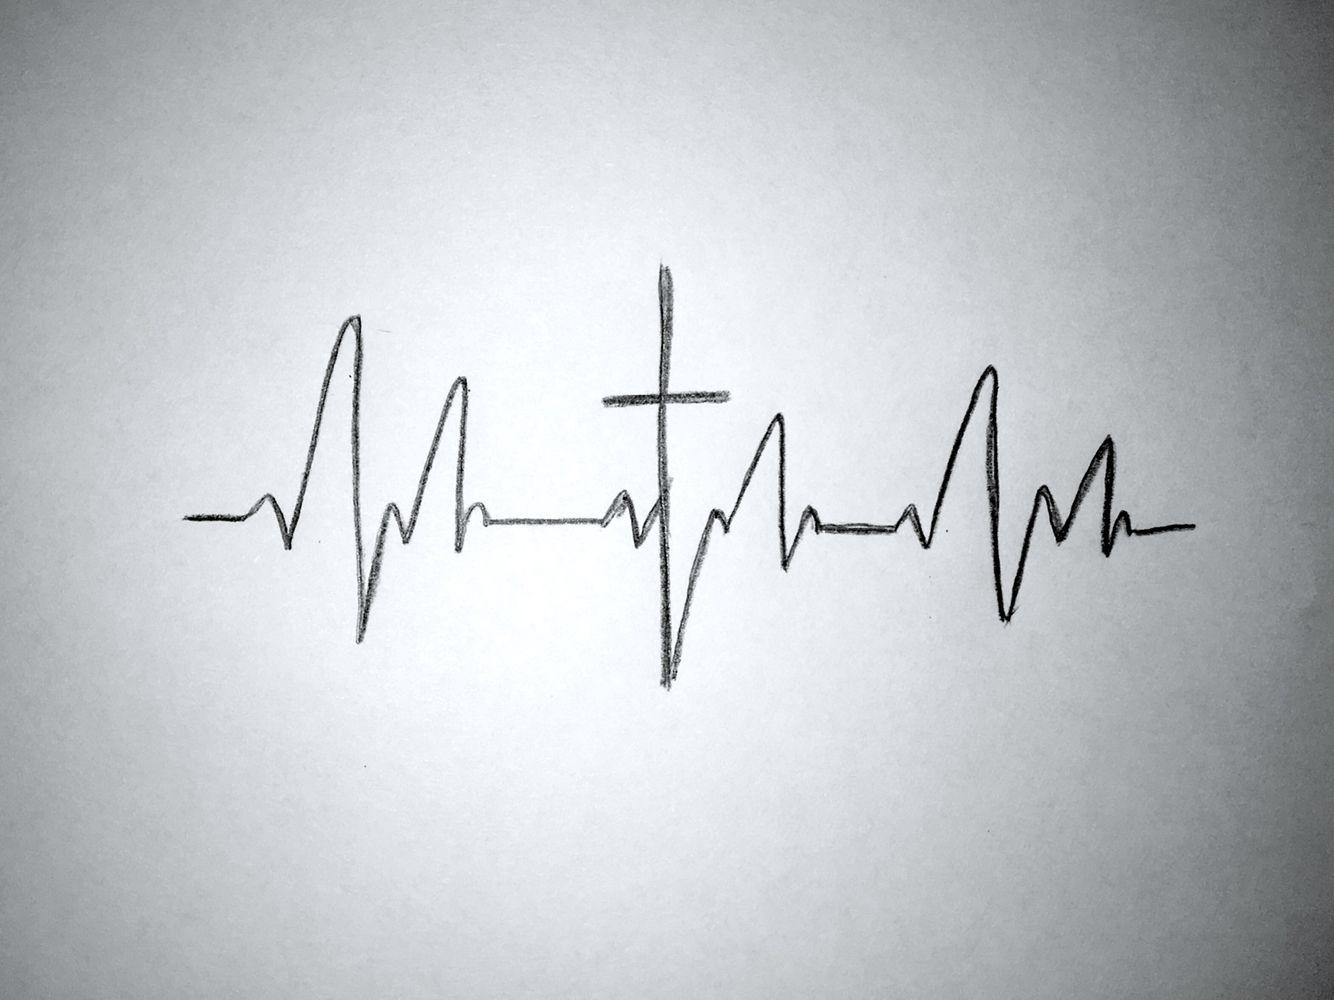 Heartbeat Line Art : Tattoo idea cross in middle of a heartbeat hair makeup